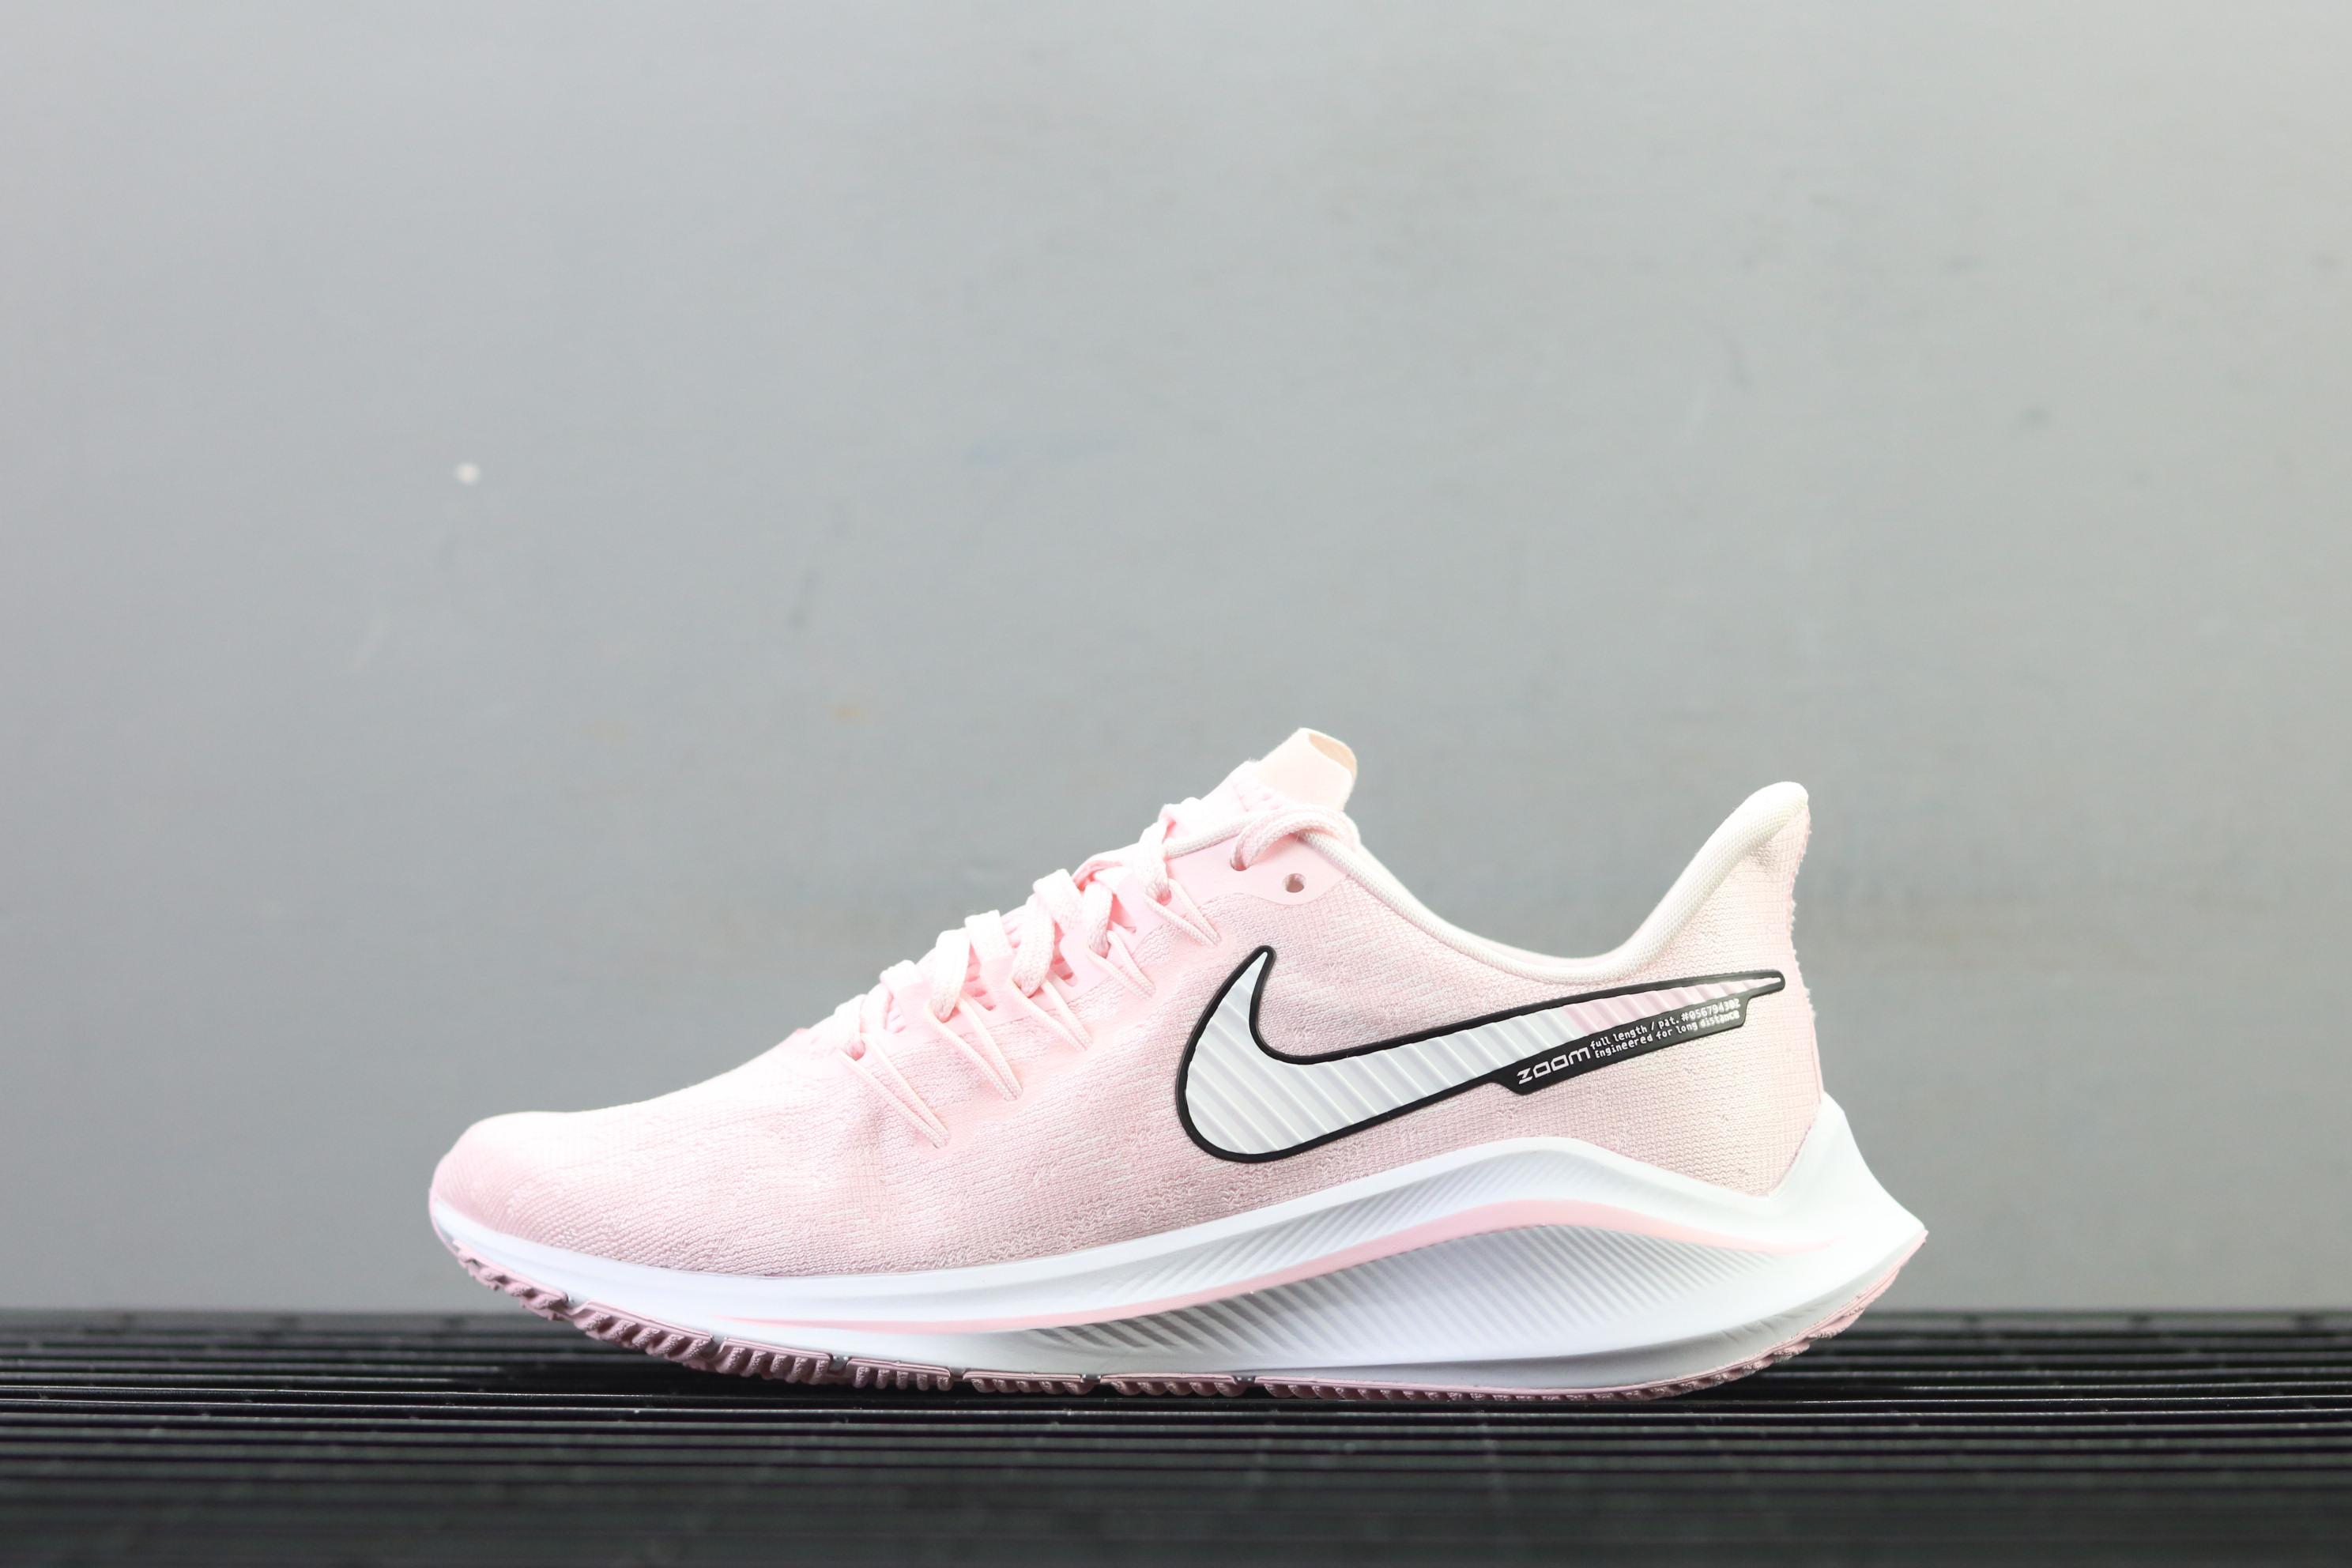 Nike Air Zoom Vomero 14 Pink White